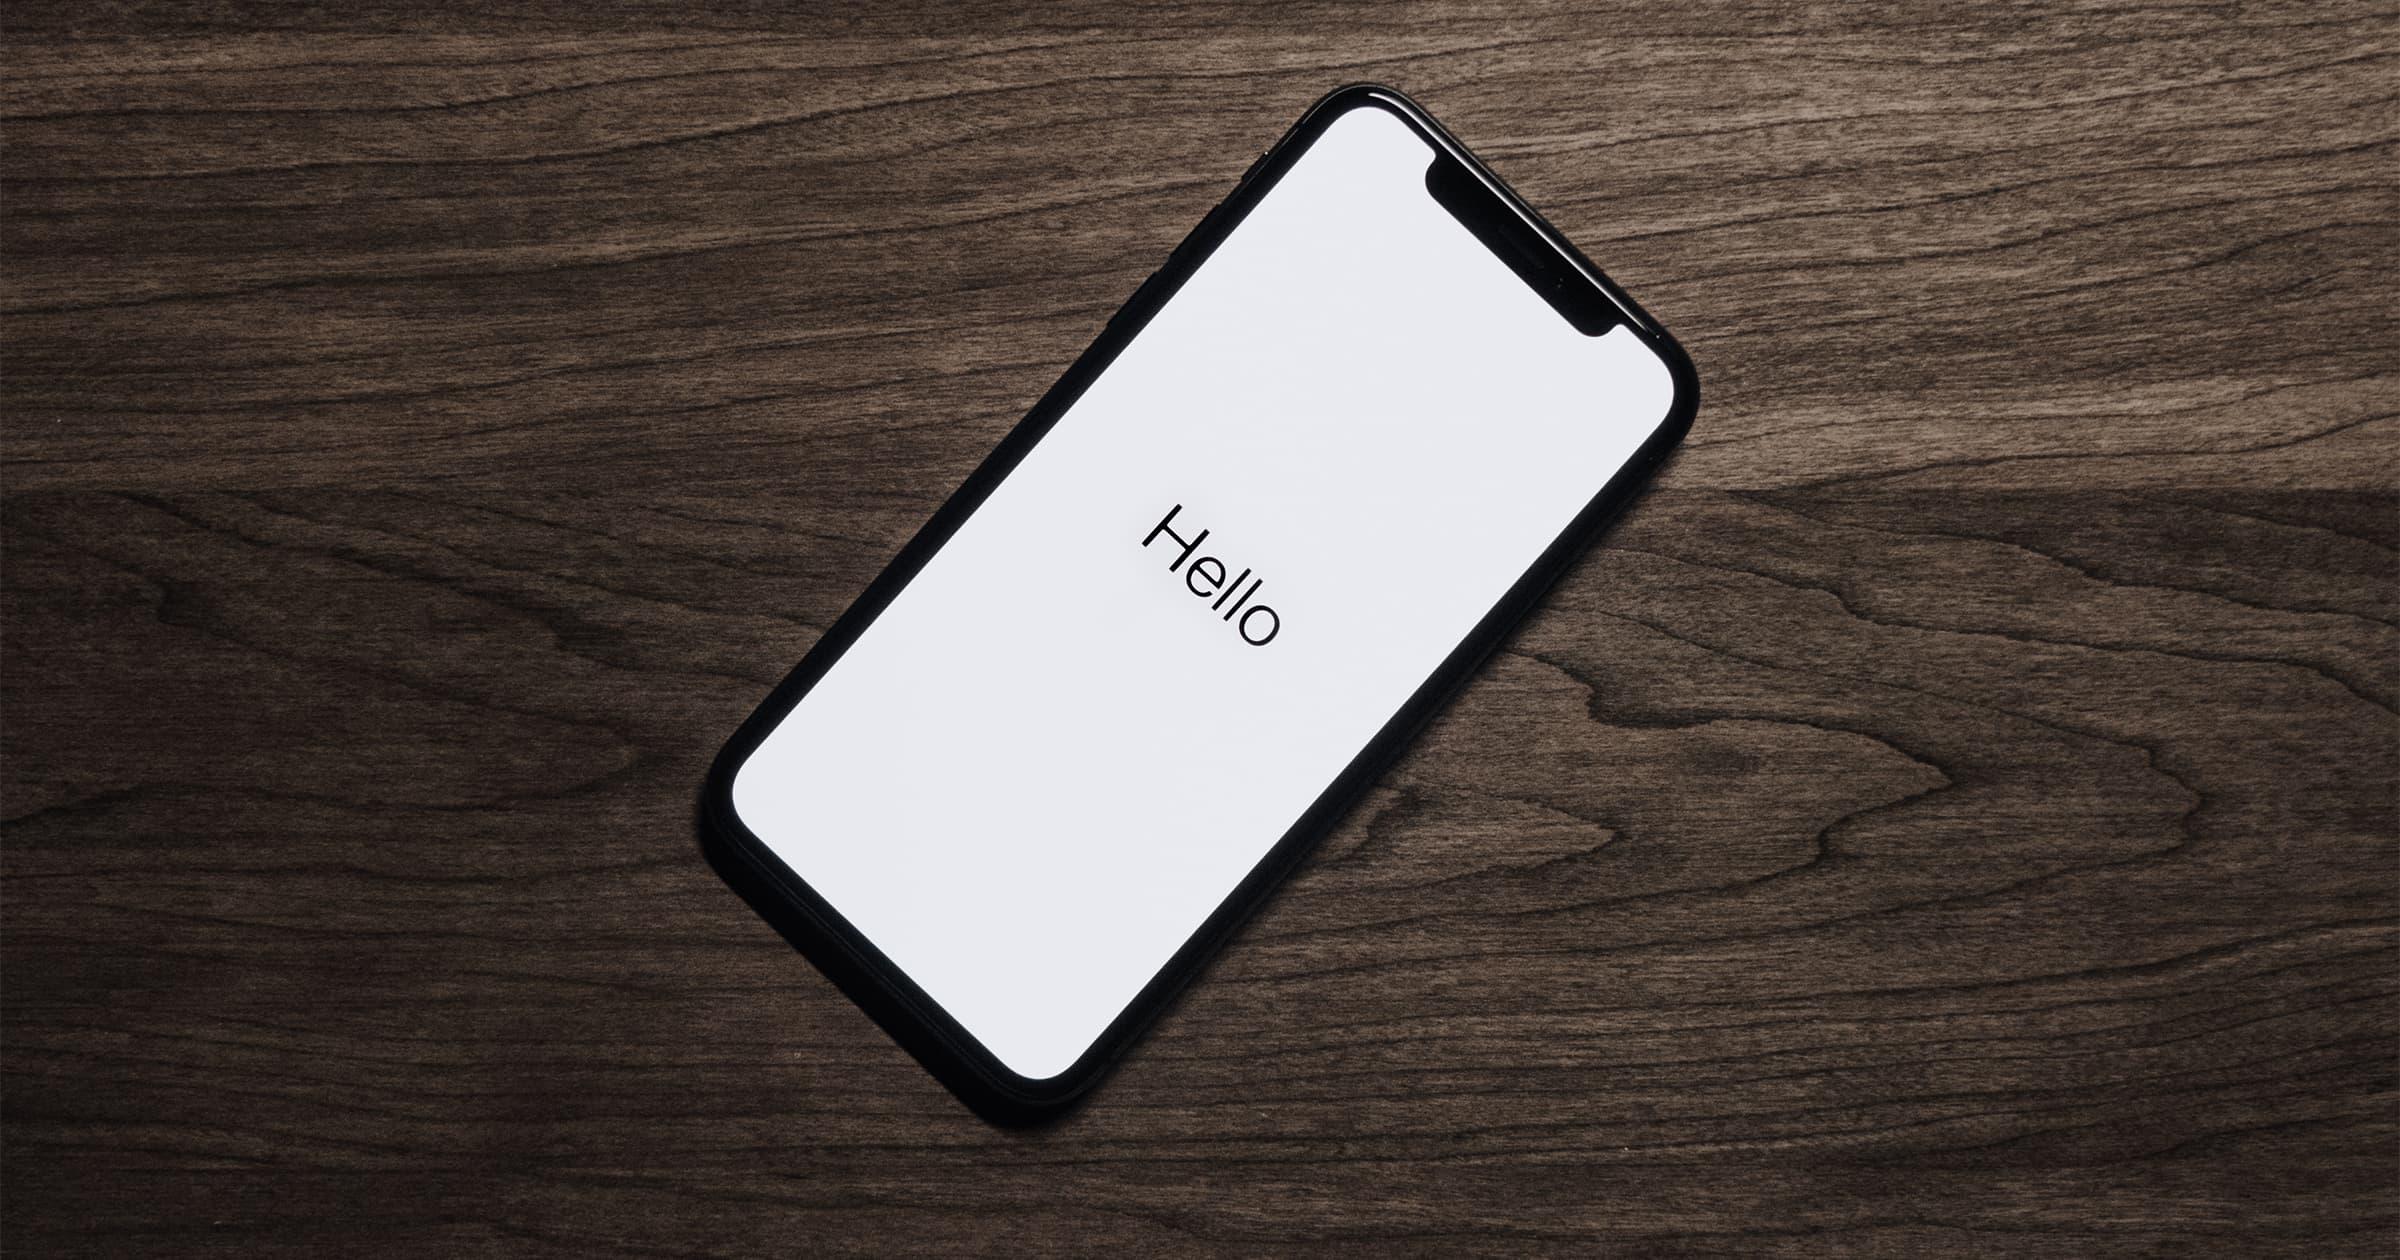 fotograafia iphone x iphone'ga pildistamine telefoniga pildistamine kasulikud nipid pildistamine iphonega pildistamise nipid arvustus tagasiside apple rauno vahtre fotograaf tagasiside iphone X camera review eesti mobipunkt